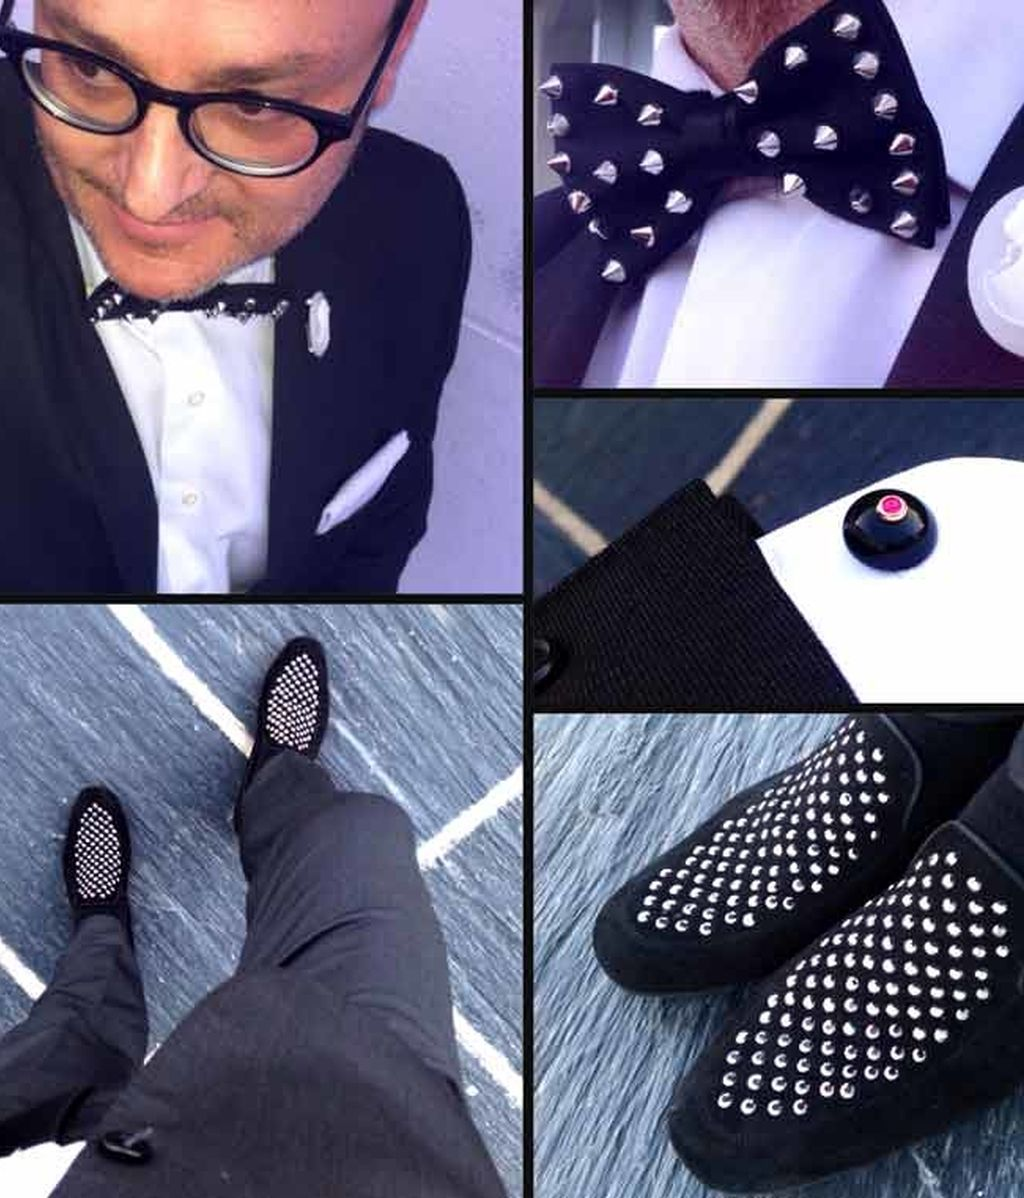 Black&White&Spikes (26/11/2013)